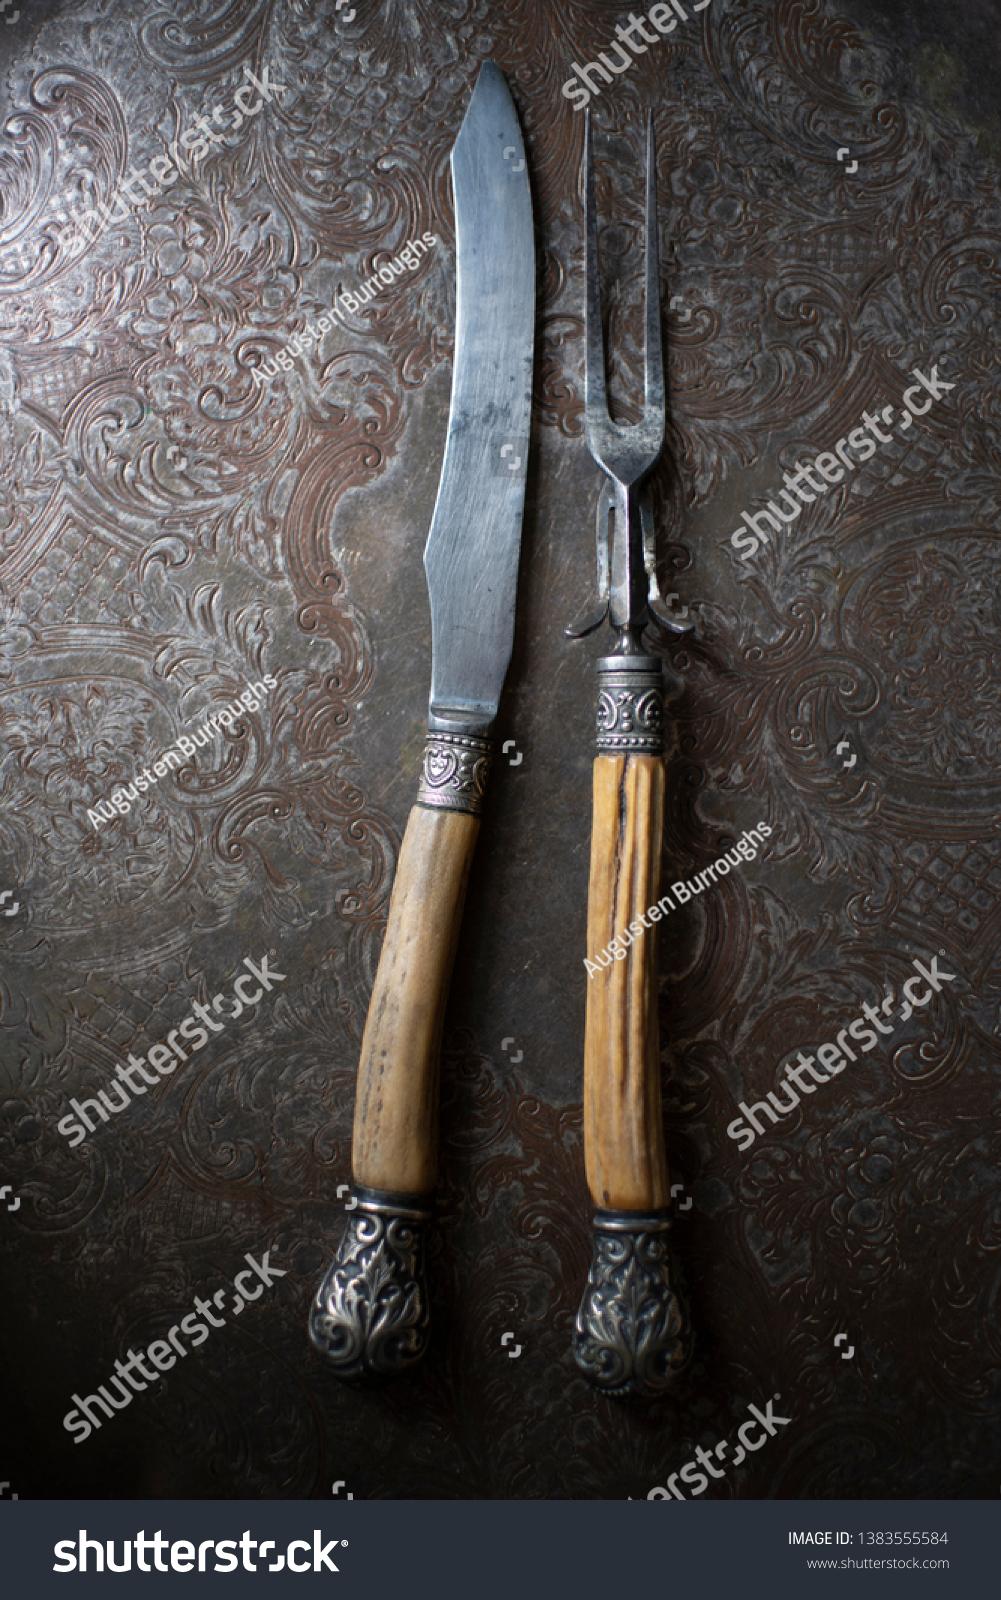 Bonehandled Carving Knife Fork On Engraved Miscellaneous Stock Image 1383555584